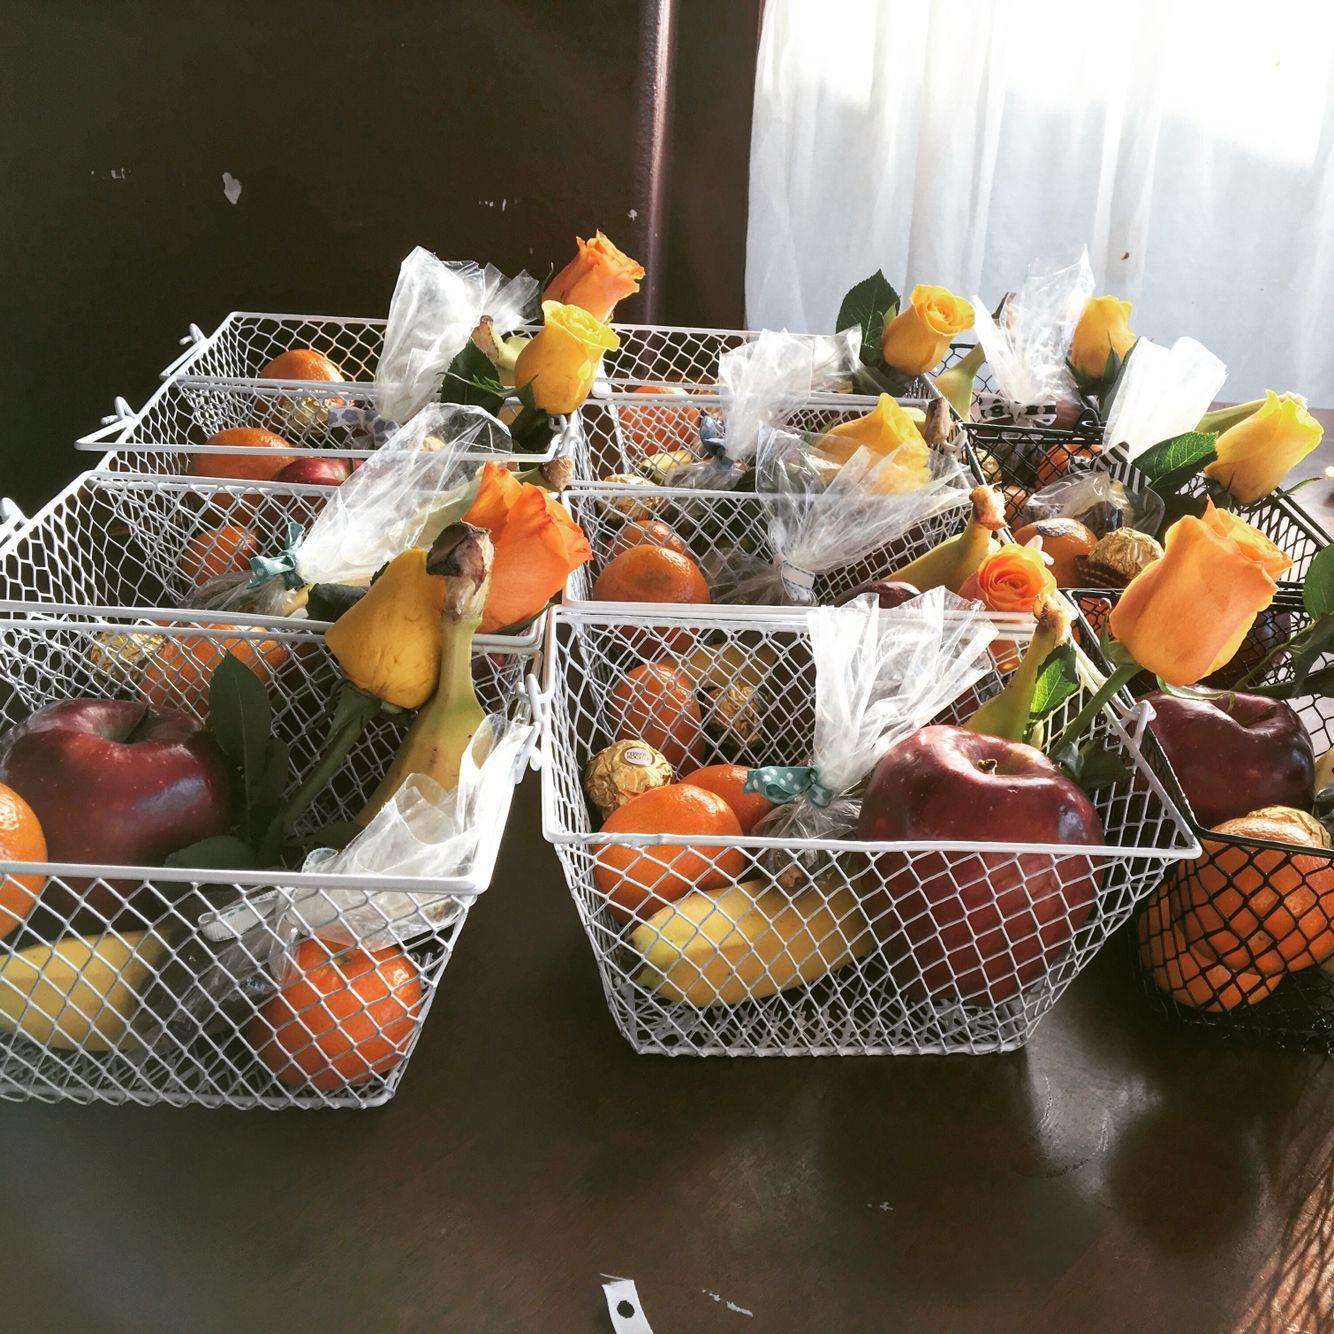 Best ideas about Pinterest Gift Basket Ideas . Save or Pin Best 25 Gift fruit basket ideas ideas on Pinterest Now.